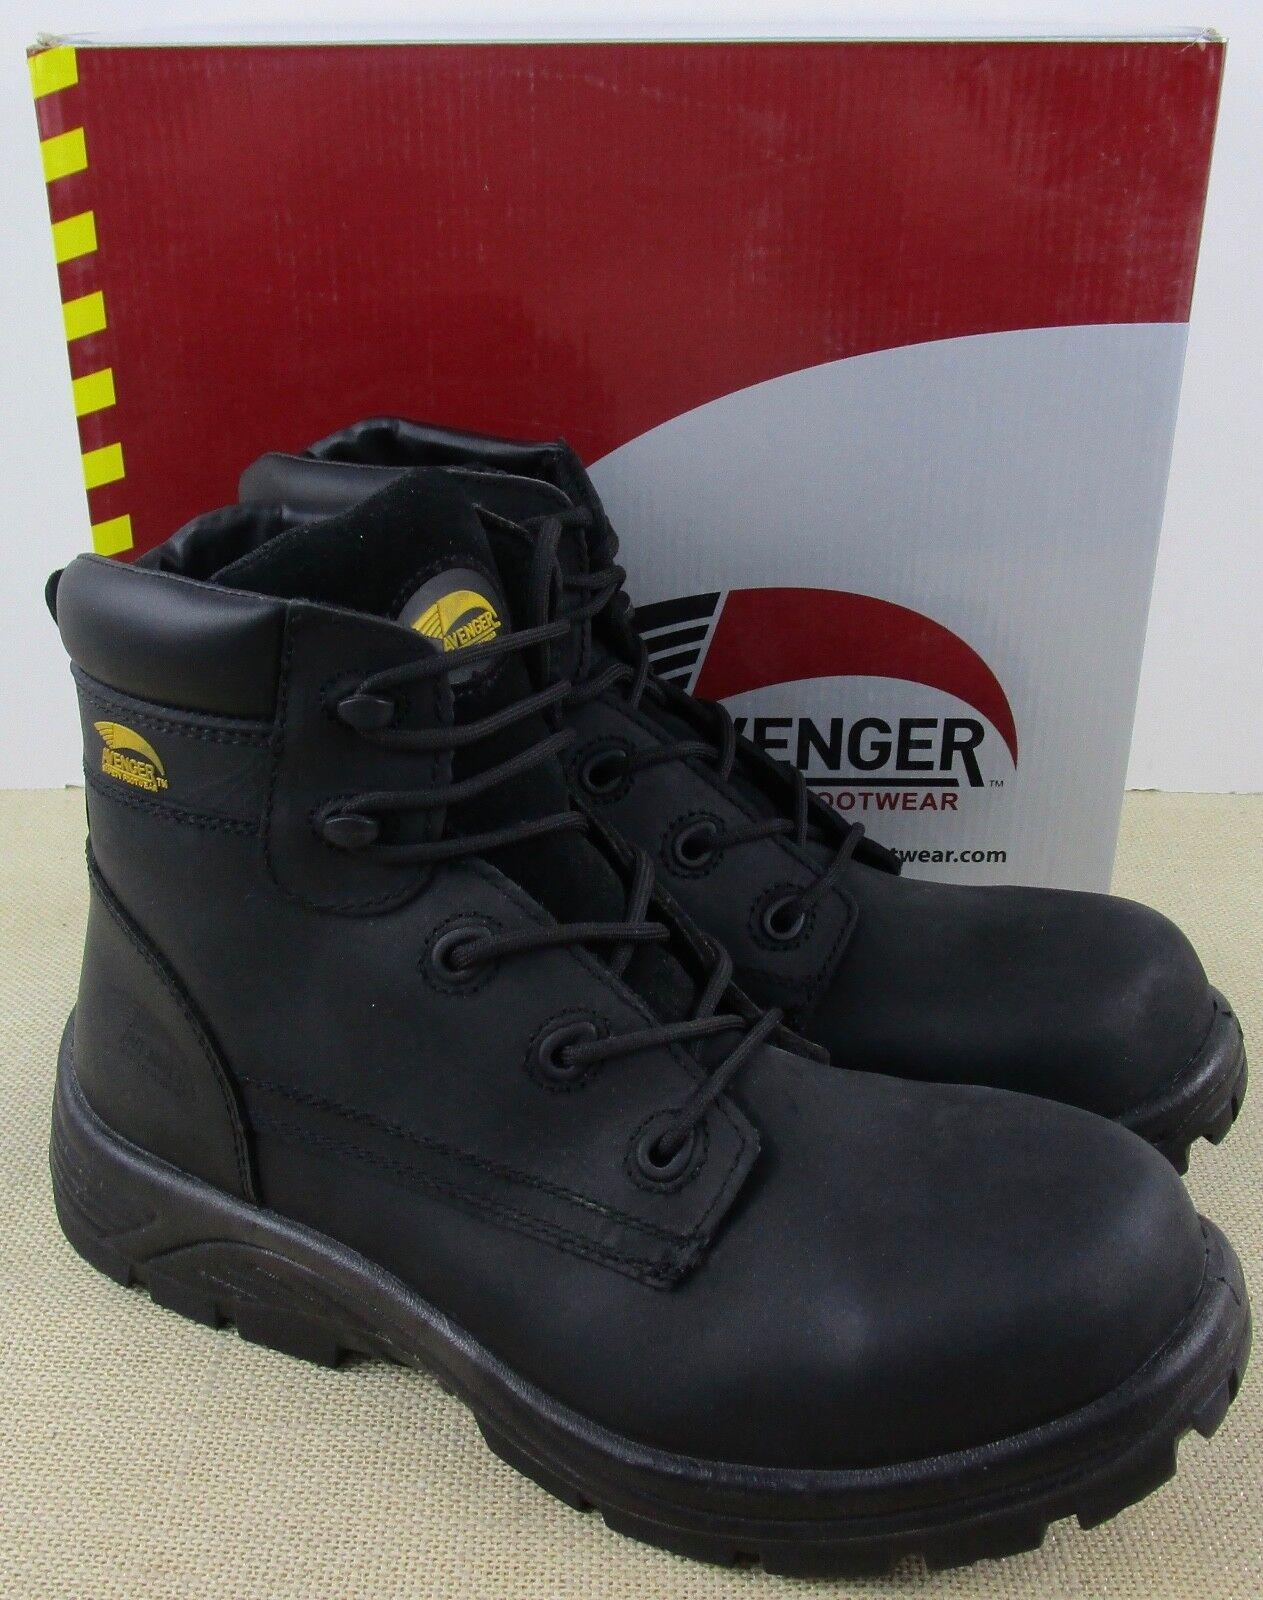 Avenger A7237 uomo neroes Leder  Verbundwerkstoff Zeh stivali  in vendita scontato del 70%